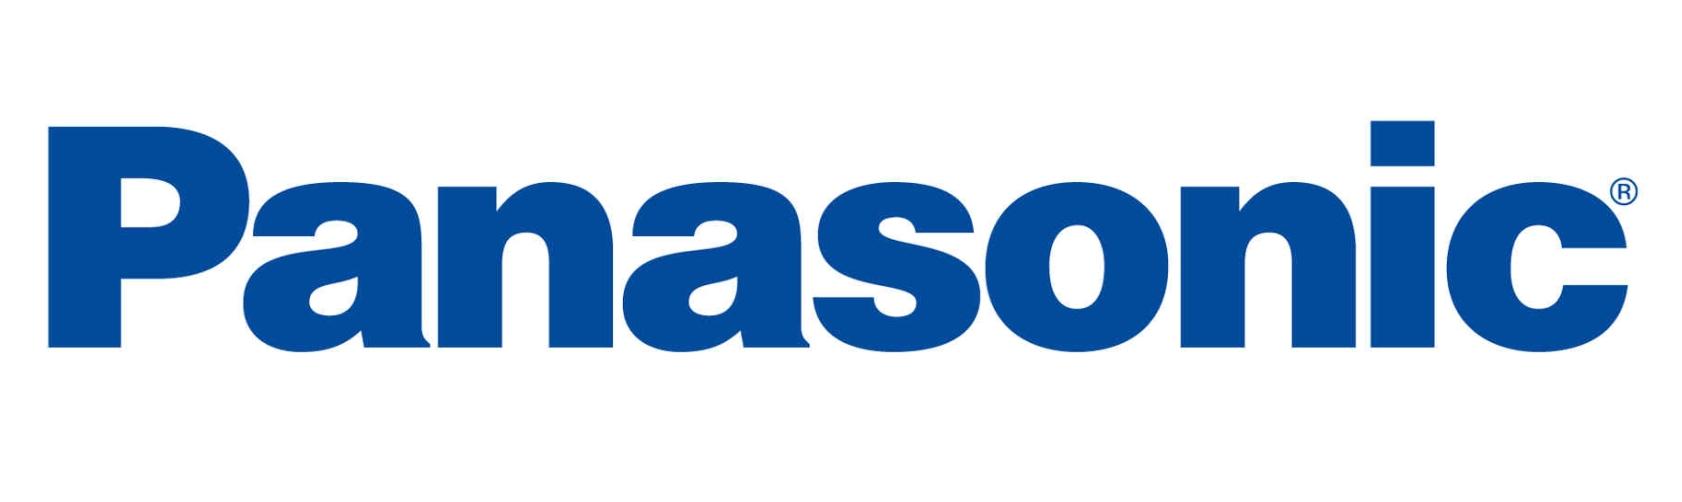 Panasonic dk support